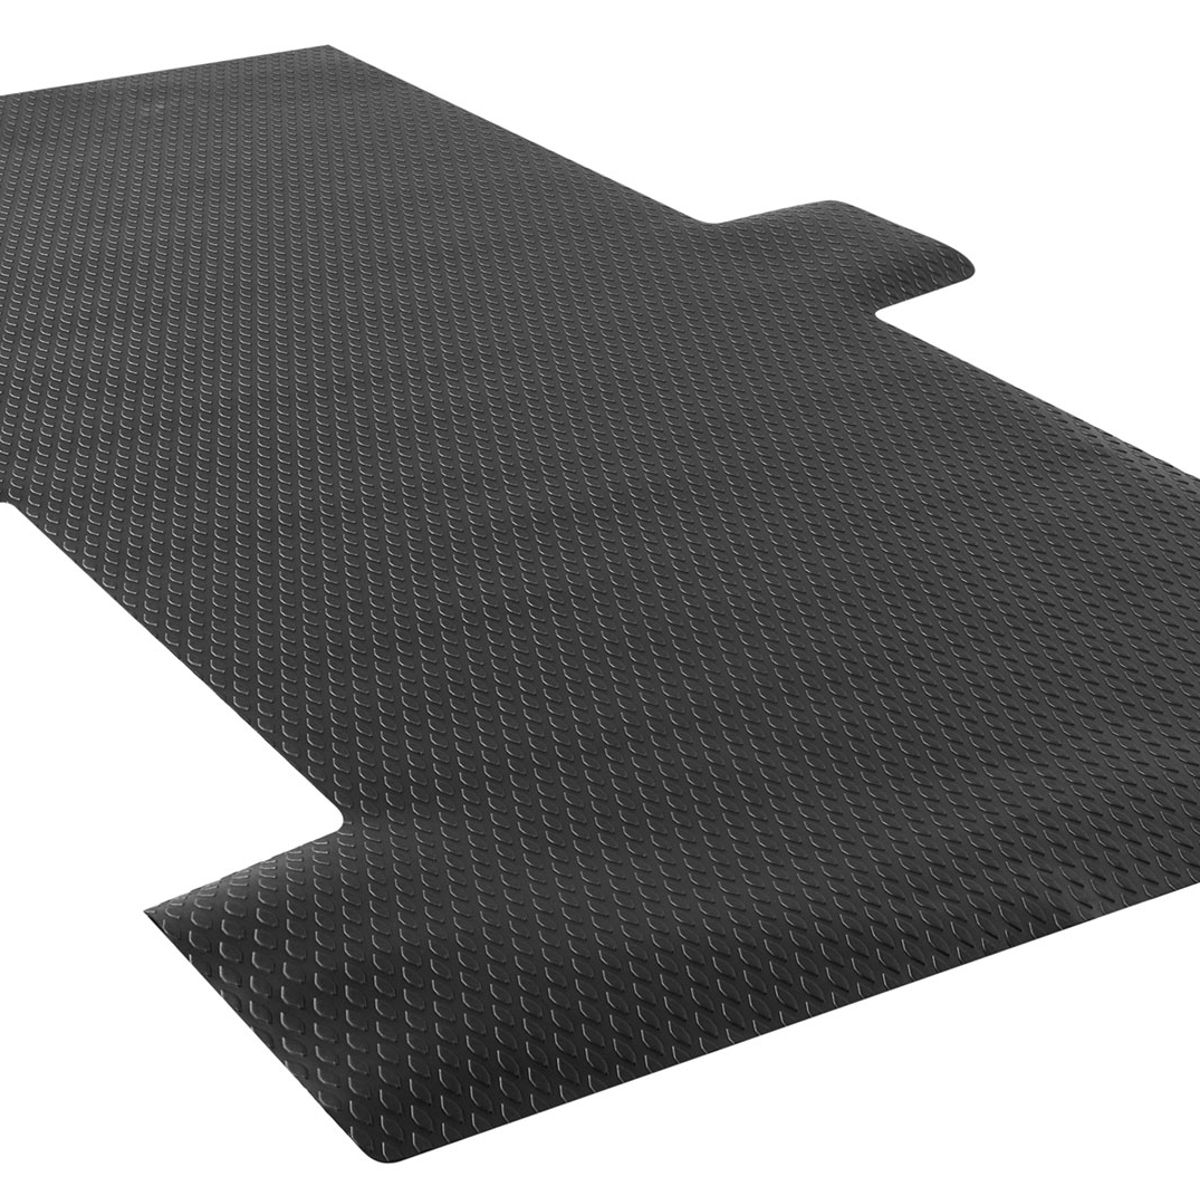 medium resolution of  floor mat ford transit 148in wheel base 6203 step ladders werner us